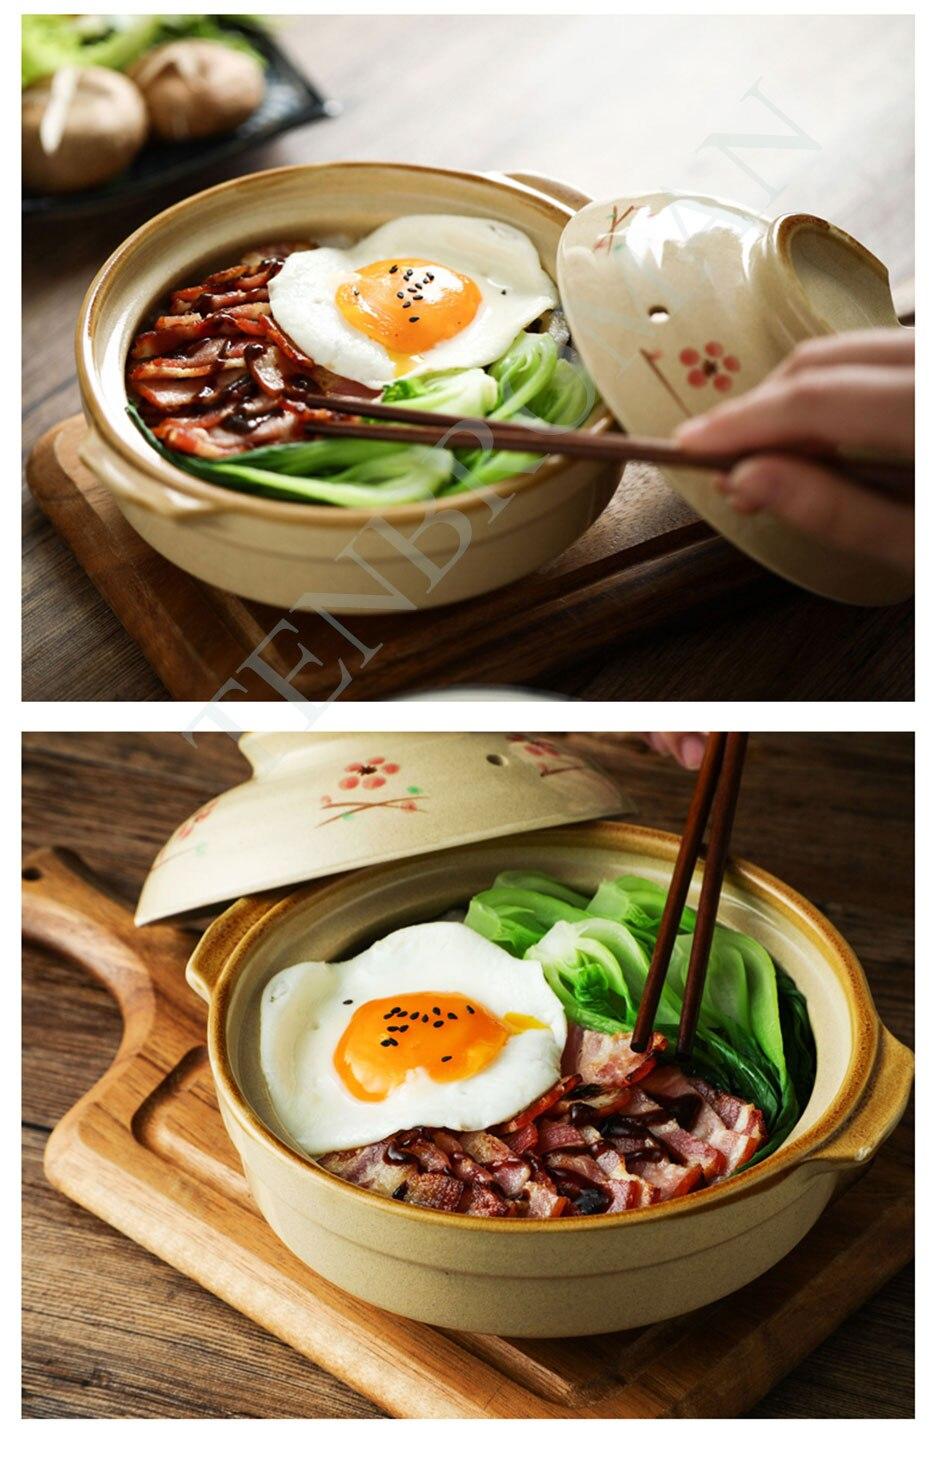 Soup Pot Crock Pot Casserole Ceramic Saucepan Soup Pot High Temperature Resistant Cooking Pan for Gas Stove cooker mx10121210